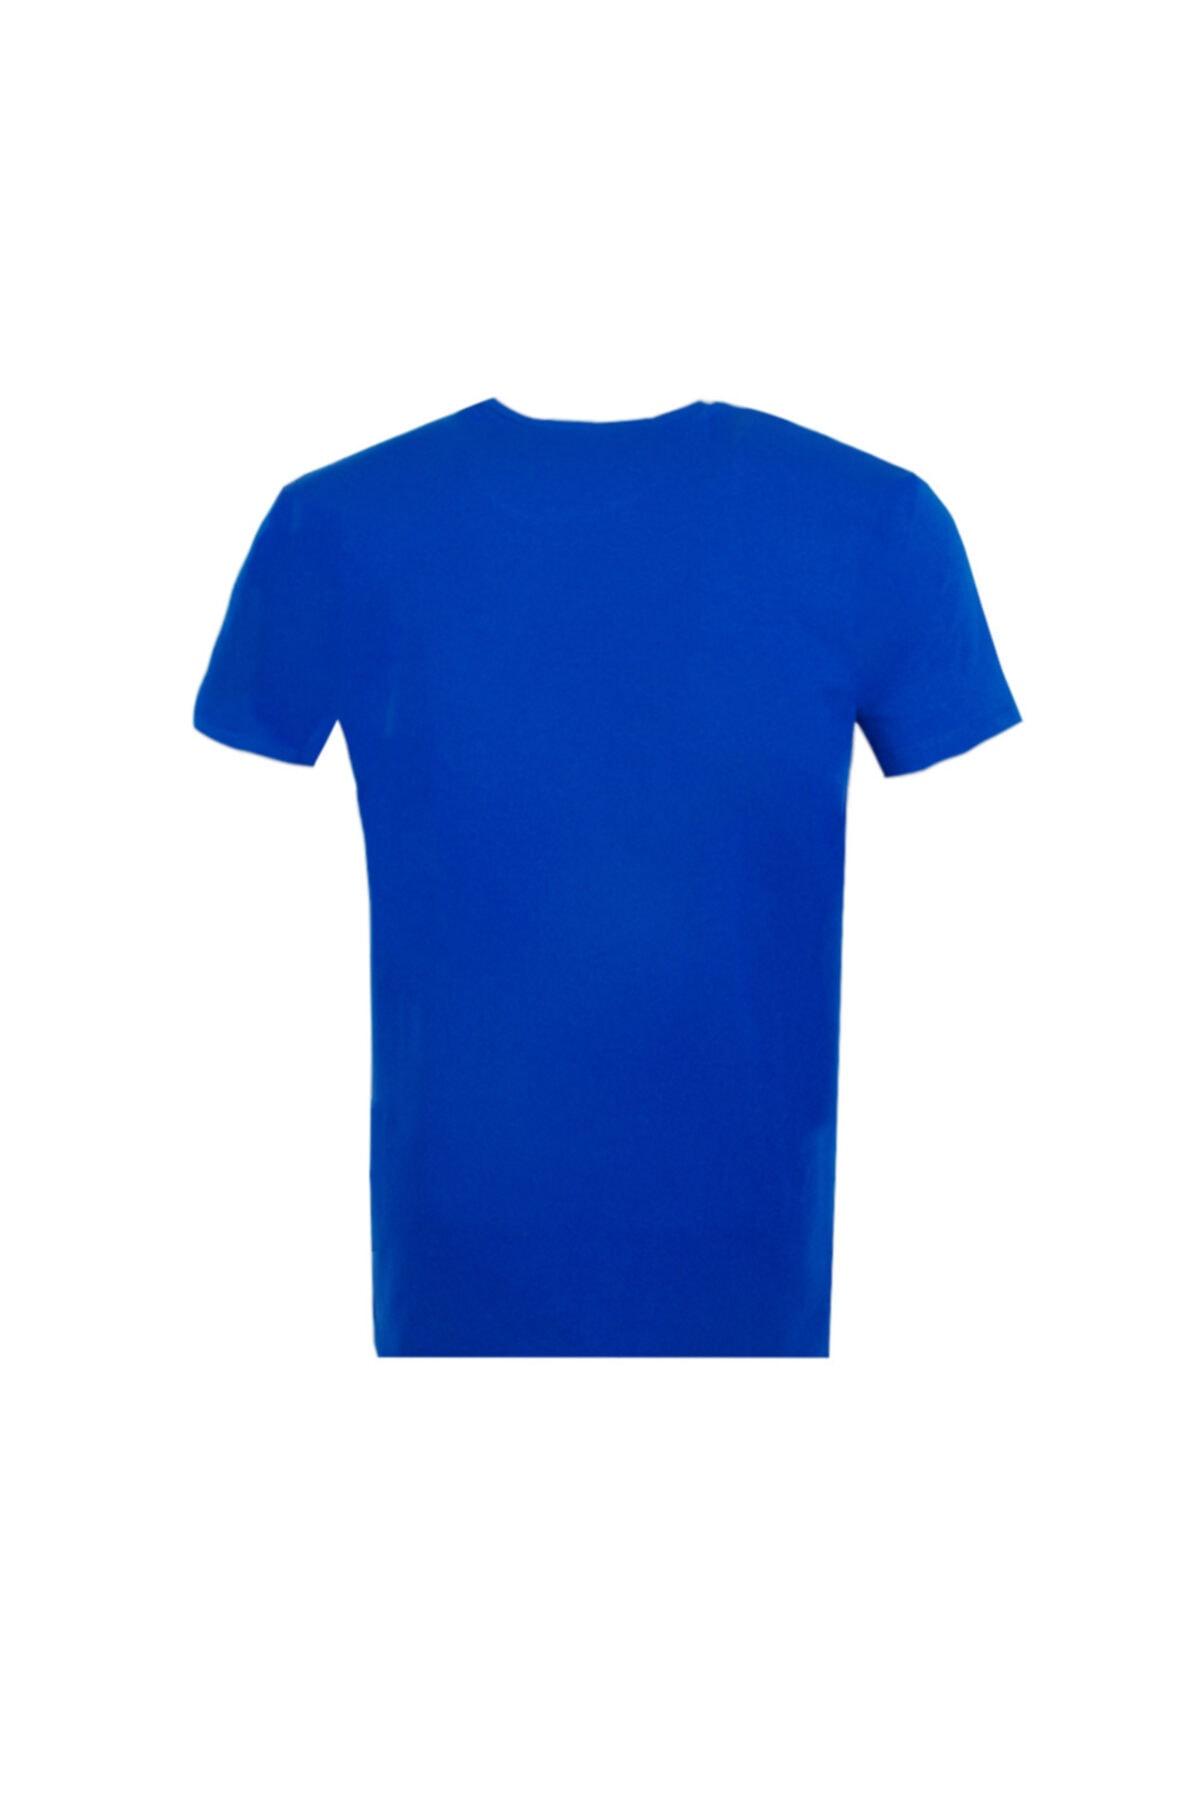 Ottomoda Erkek T-shirt Mavi 2